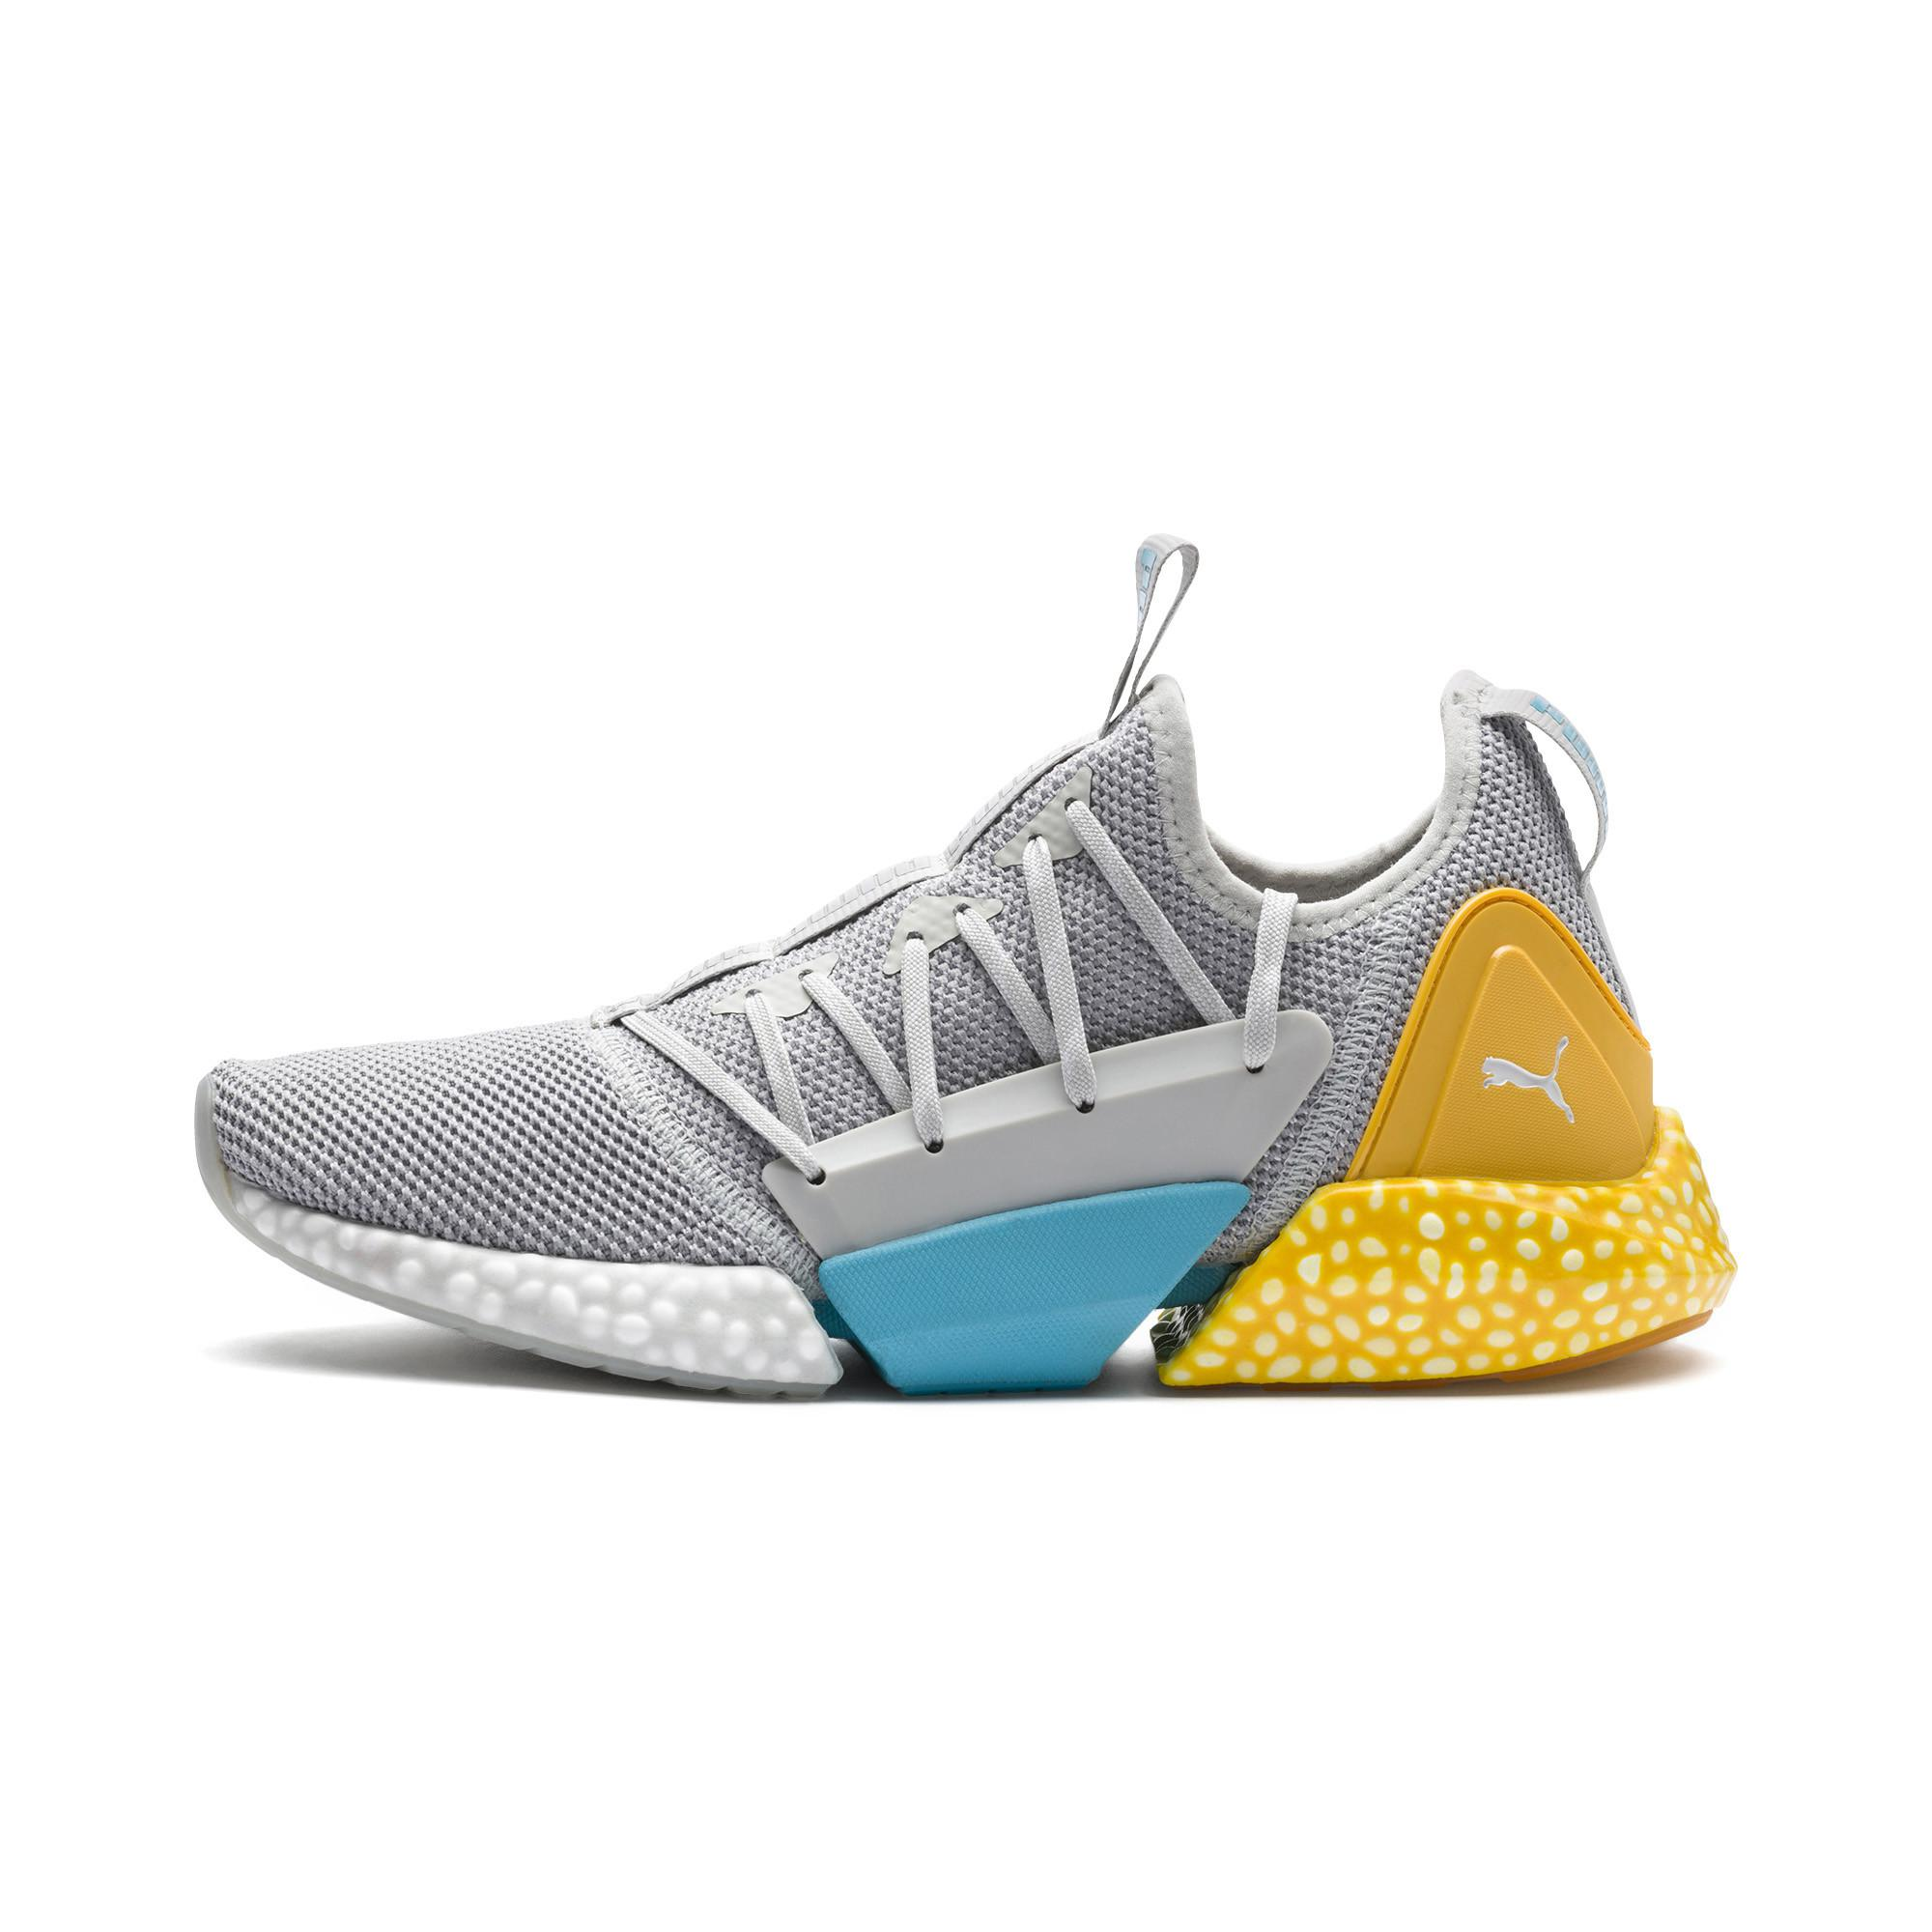 7f00f3439d5 Lyst - PUMA Hybrid Rocket Runner Men s Running Shoes for Men